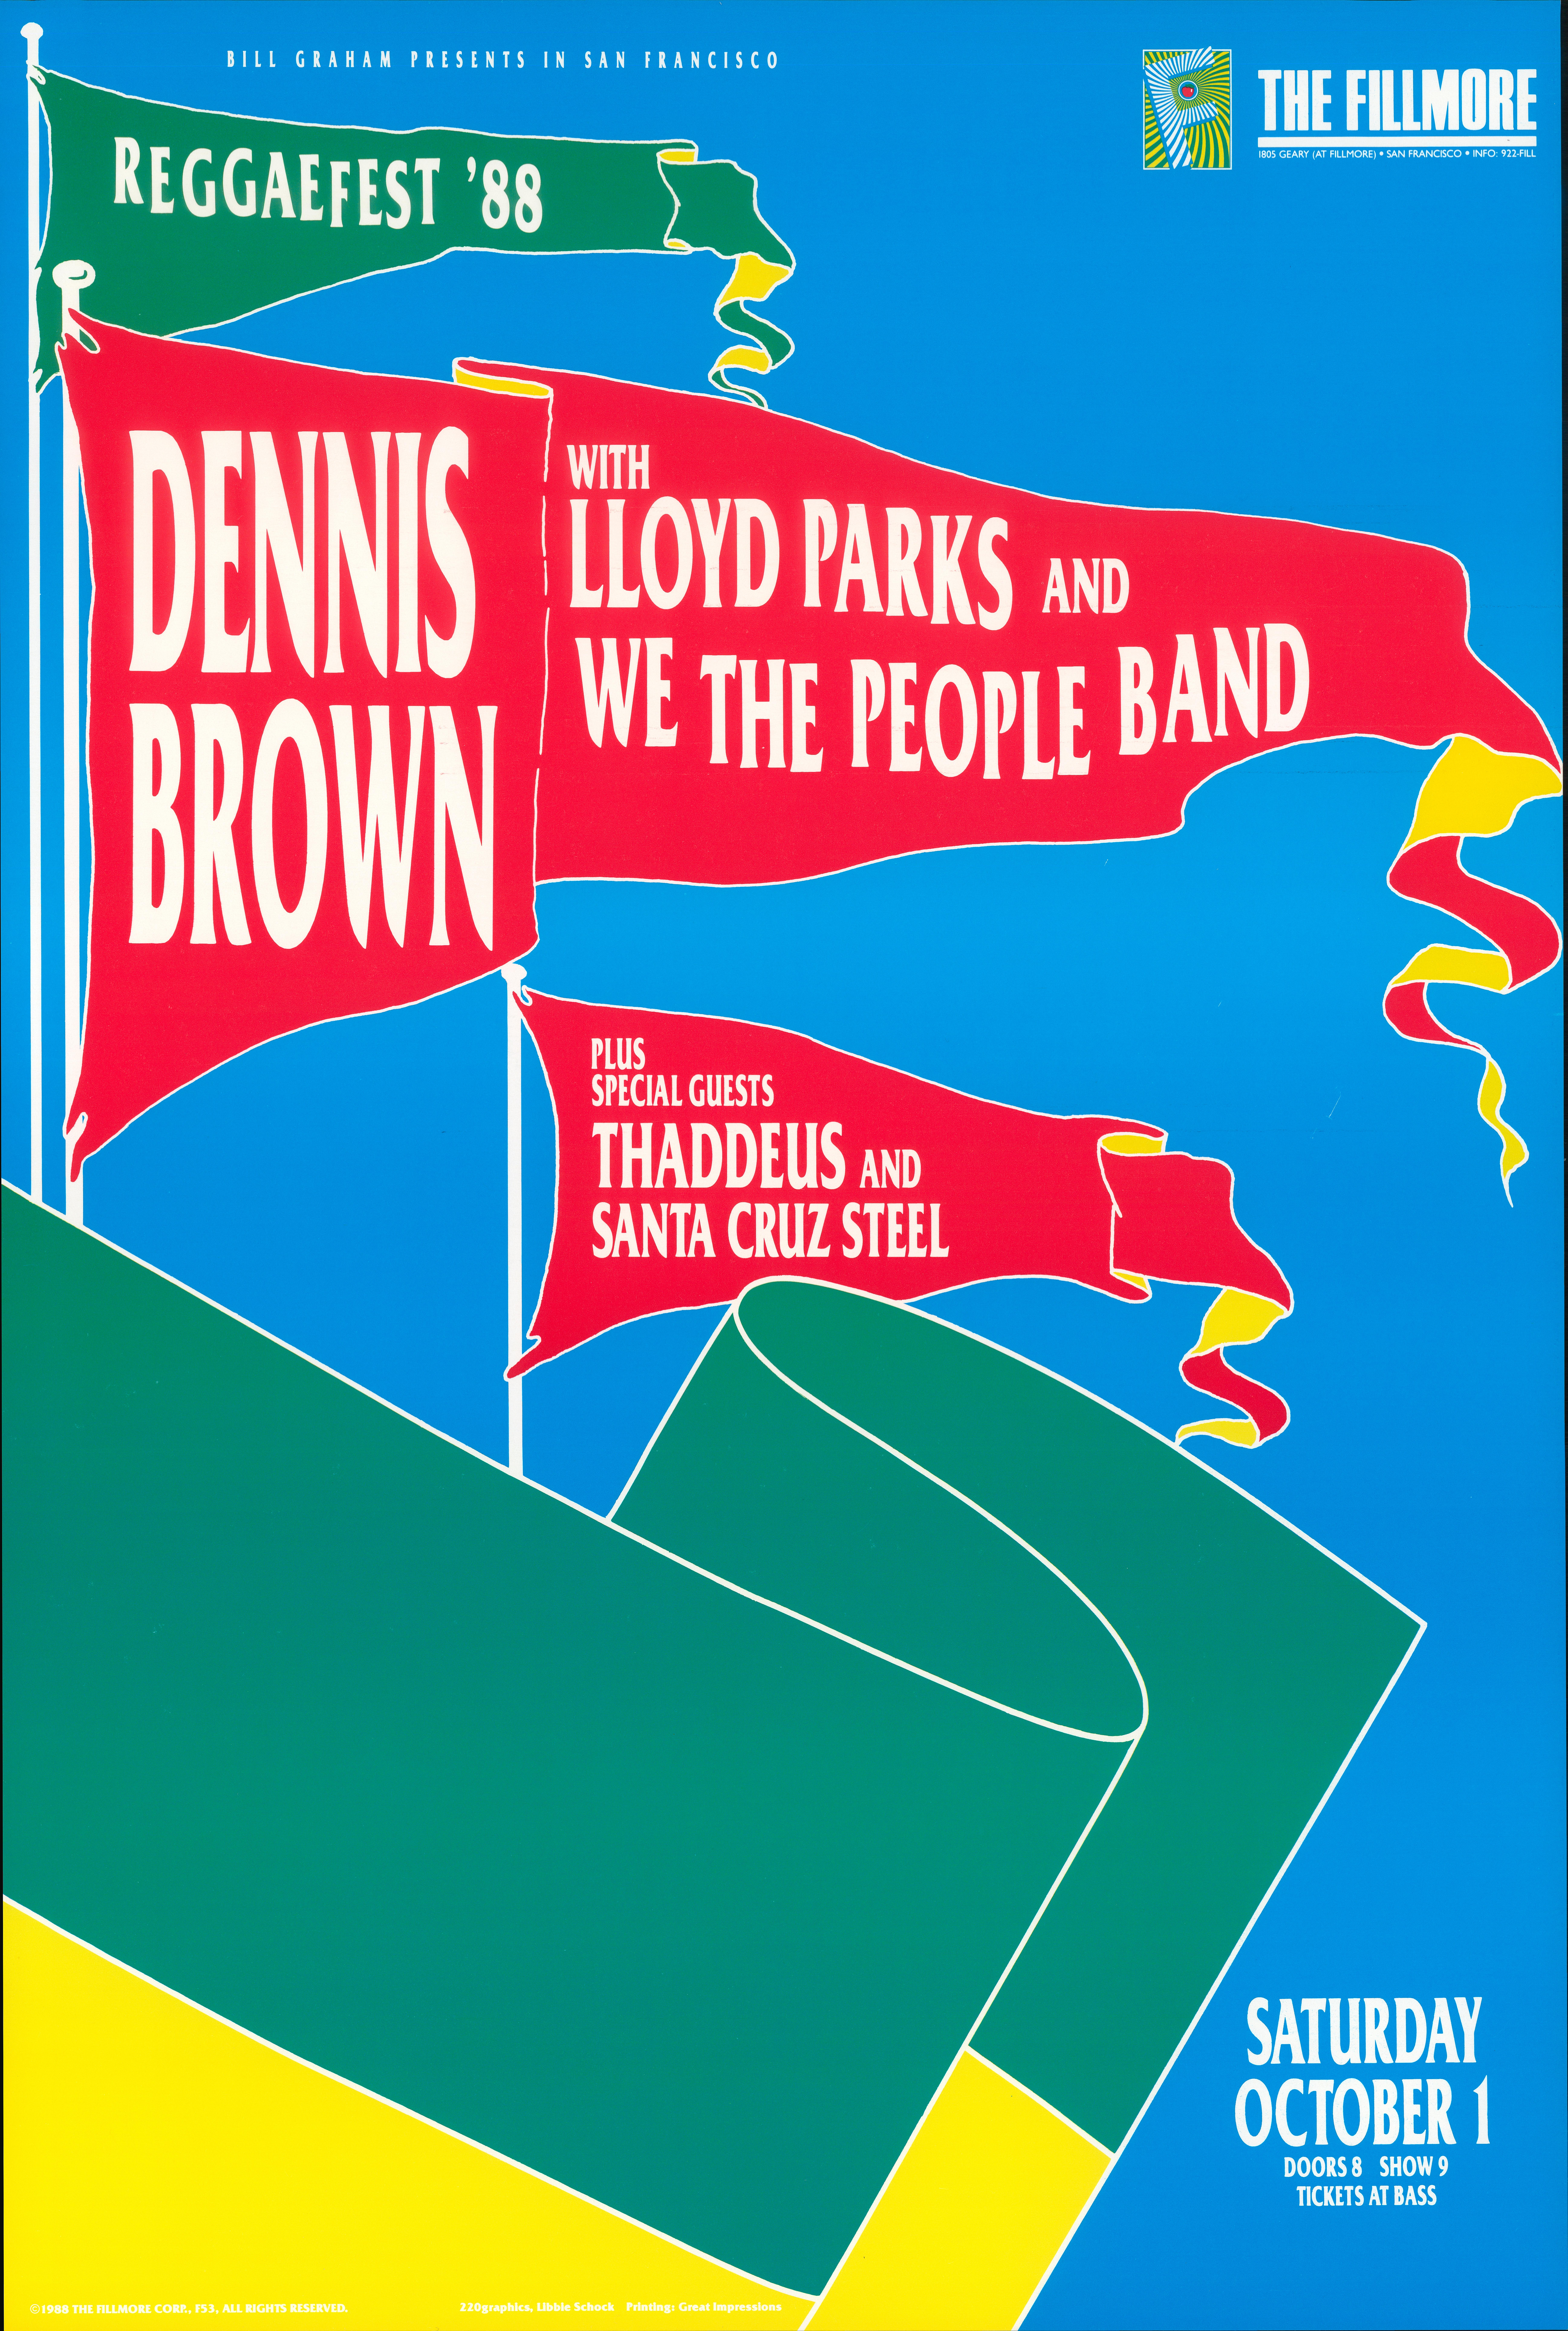 Dennis BrownPoster